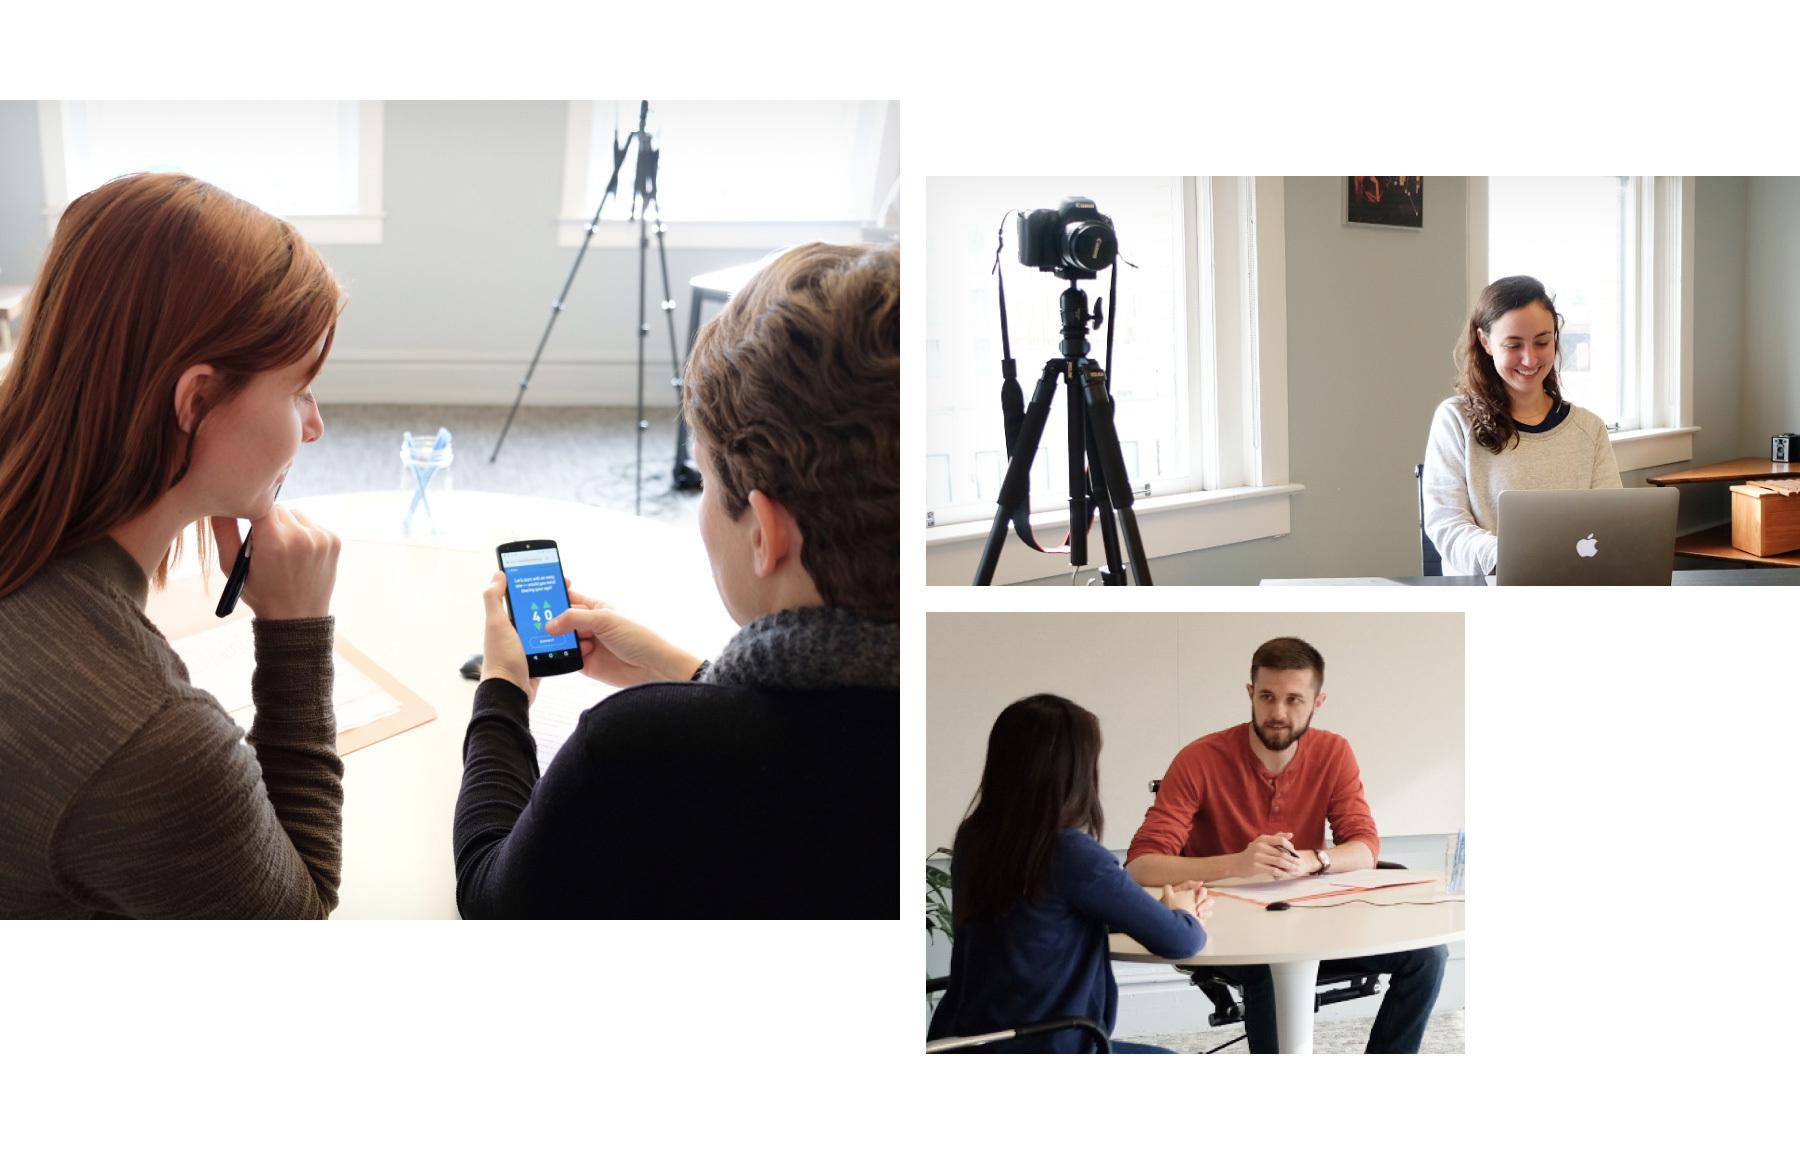 Photos of Viget UX researchers interviewing participants.